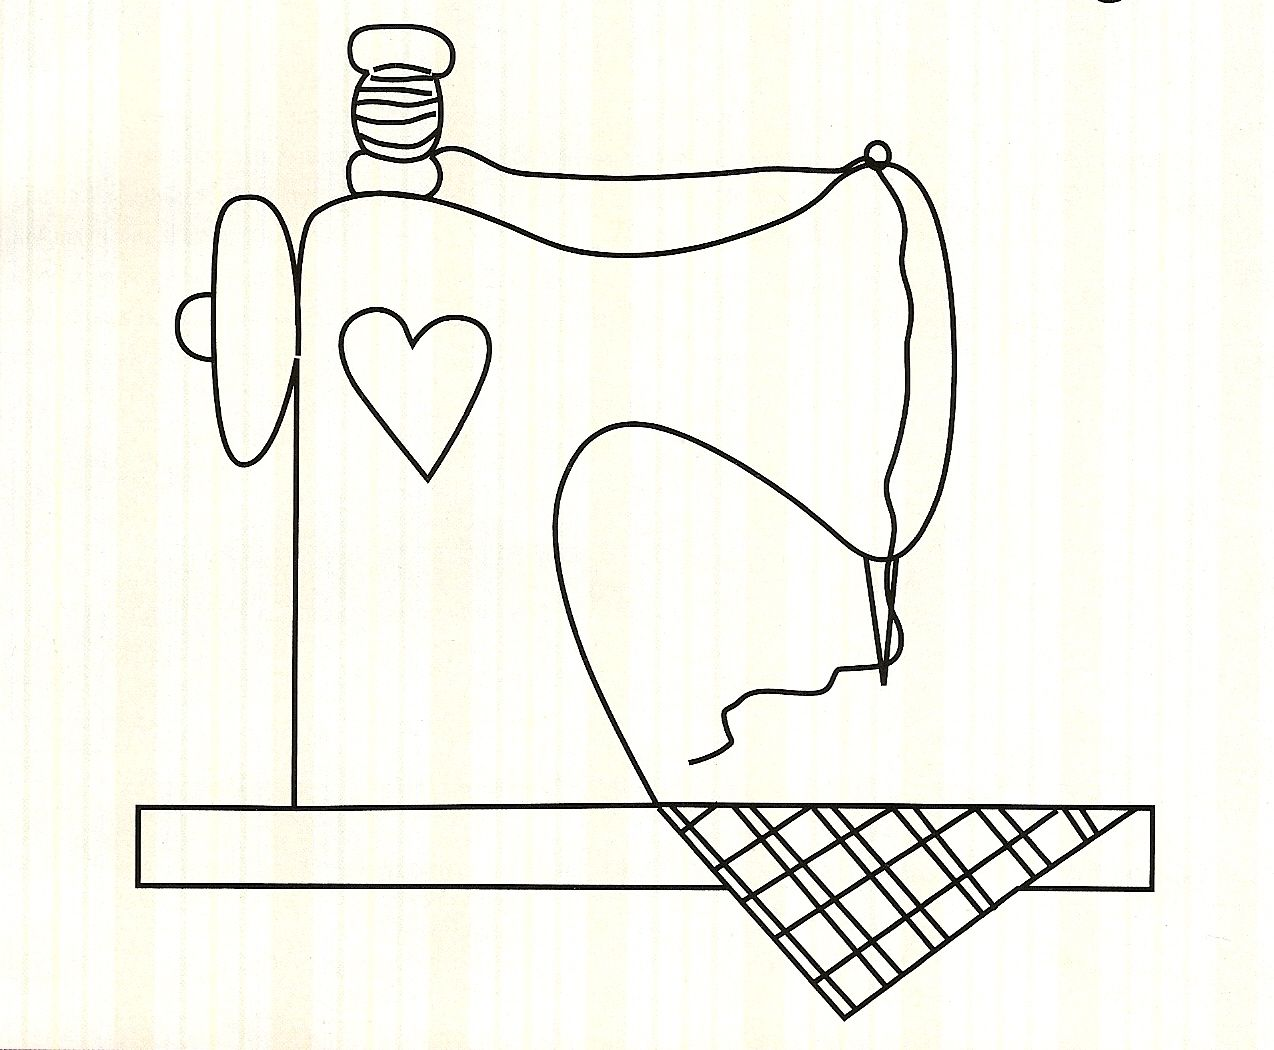 Maripê: Moldes de máquina de costura | quilting | Costura, Bordado y ...